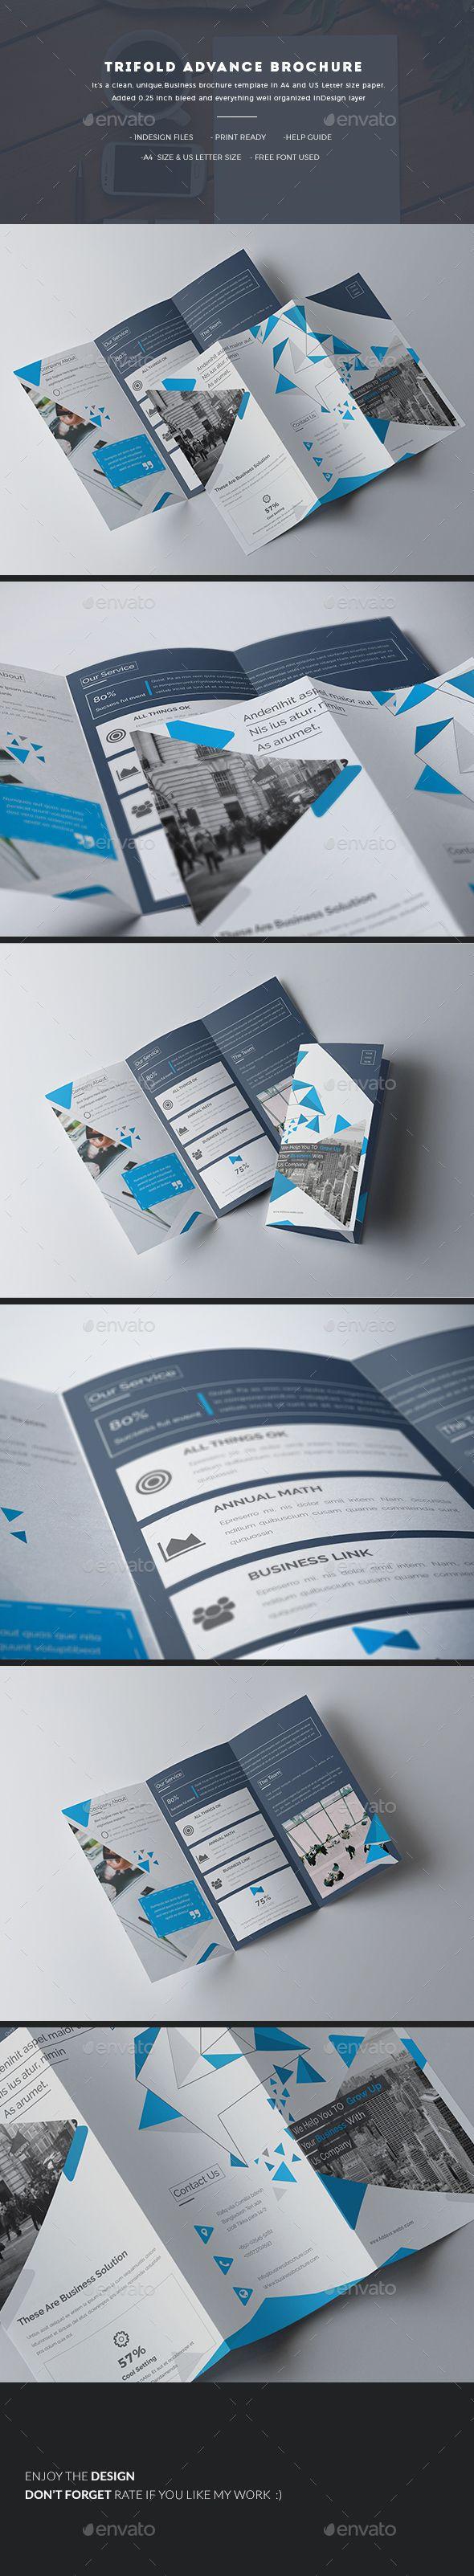 Trifold Advance Brochure | Pinterest